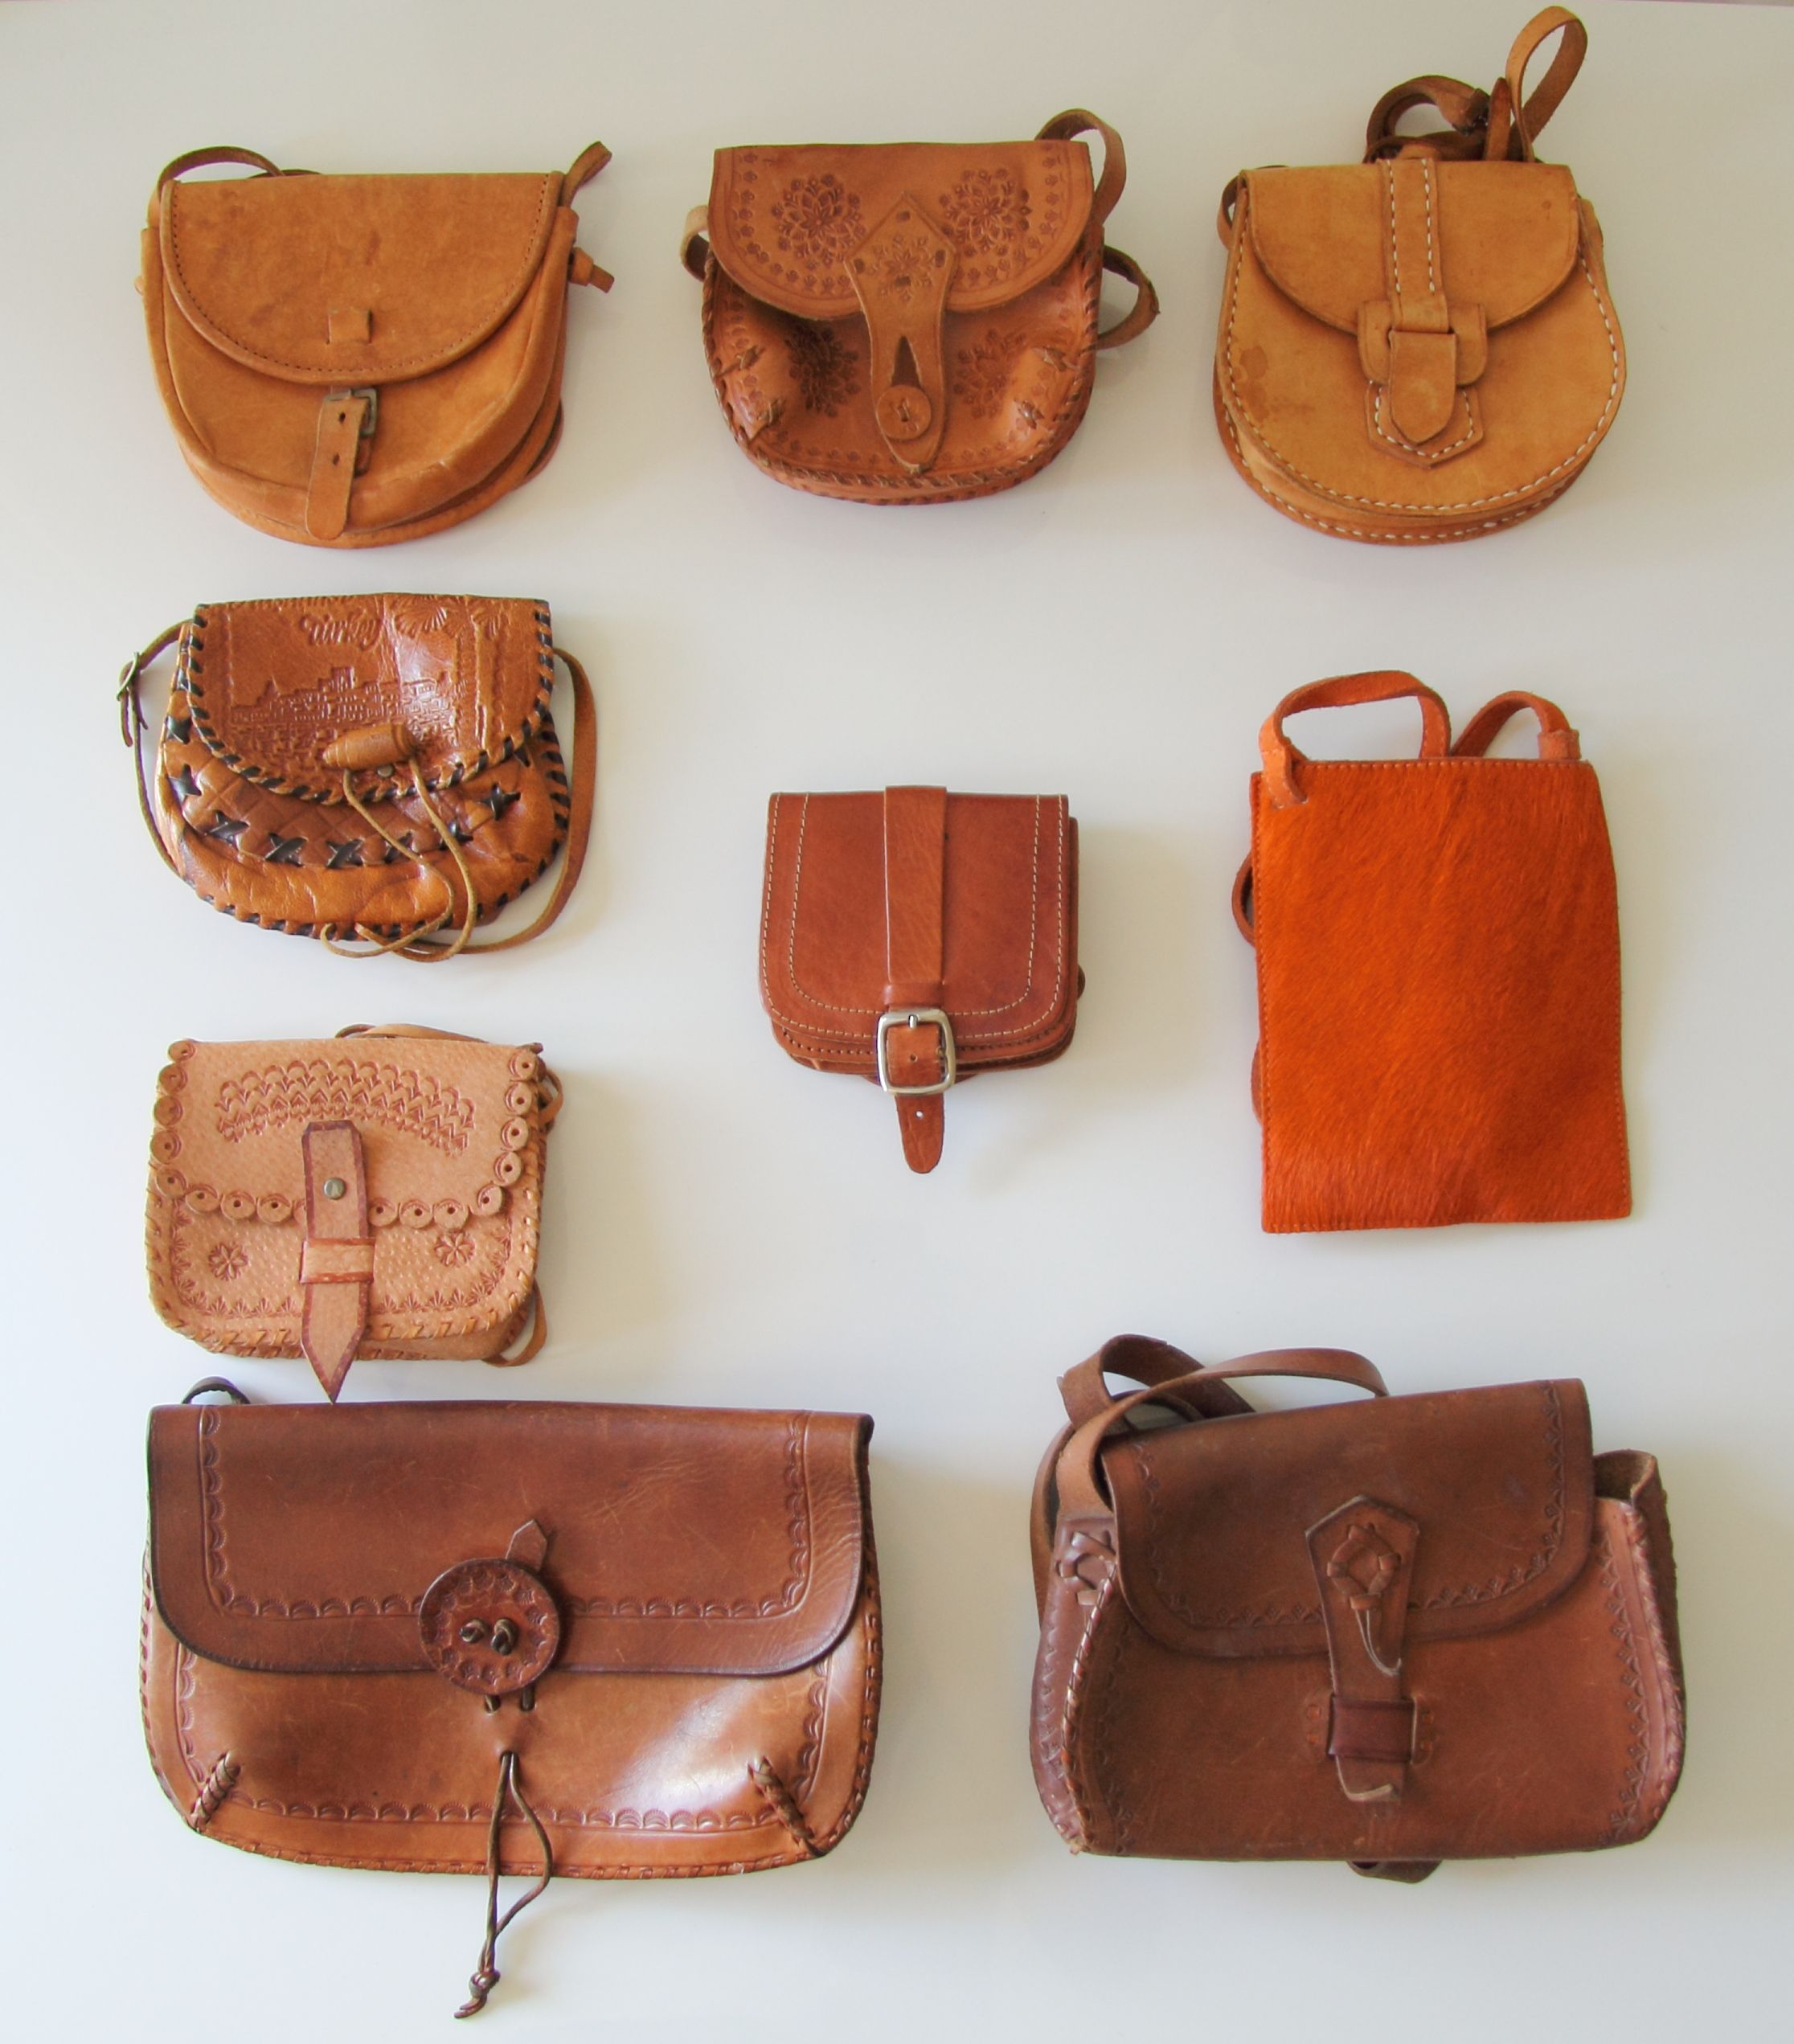 70s Purses Trendy Purses Trending Handbag Purses